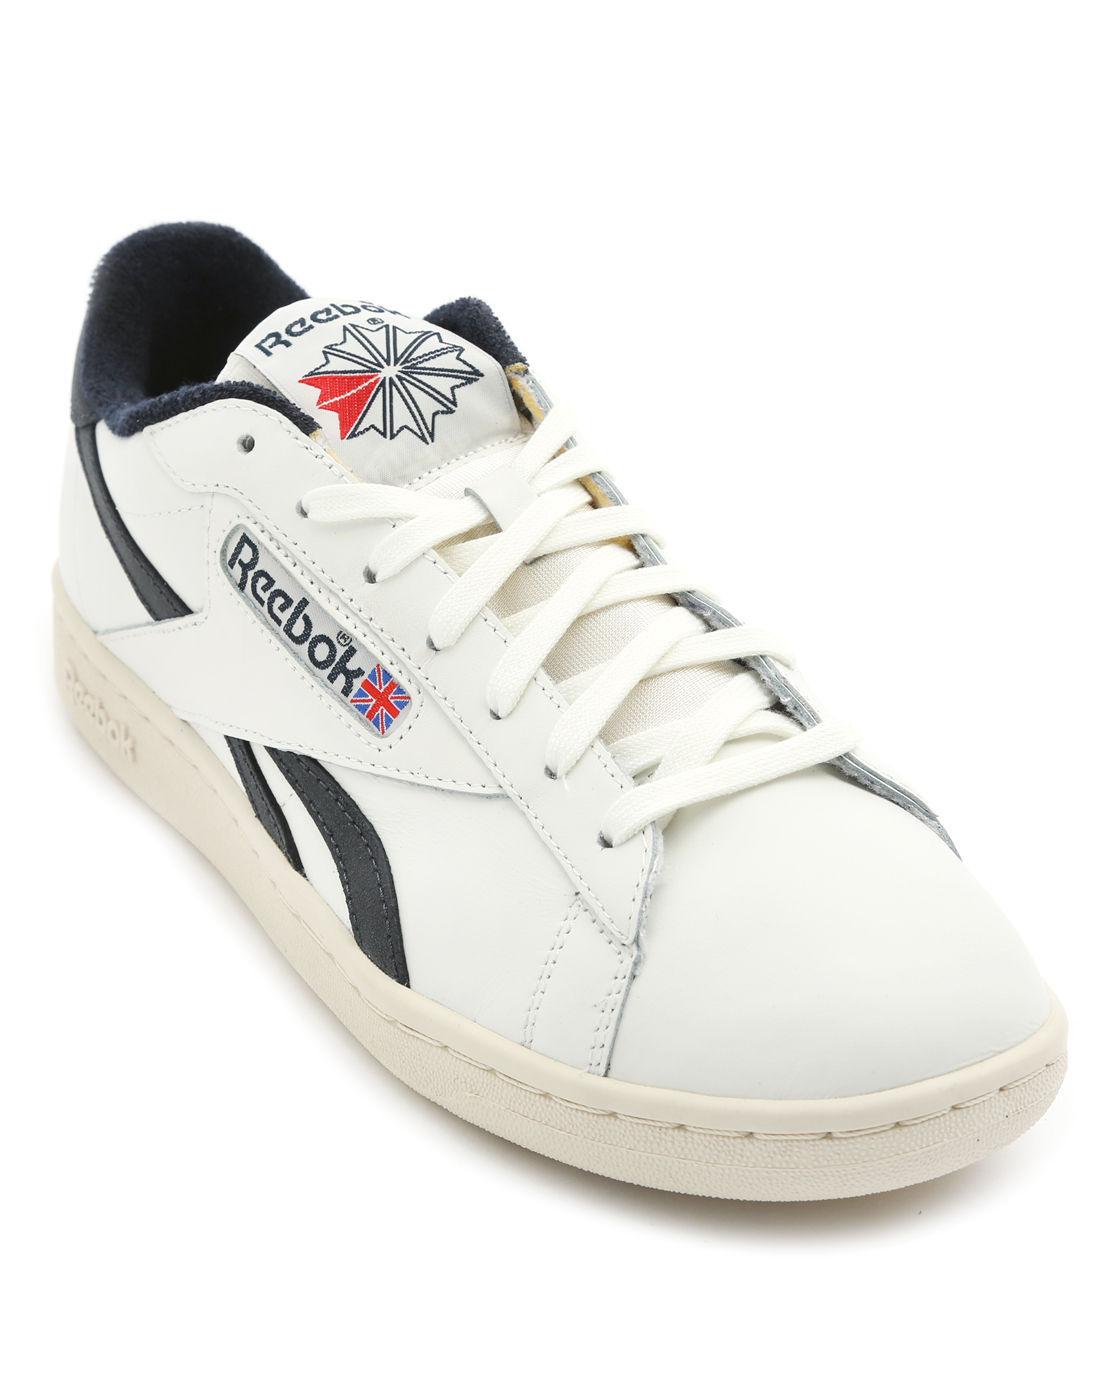 23a6eafb08c38 Reebok Sneakers White escargot-de-monceau.fr